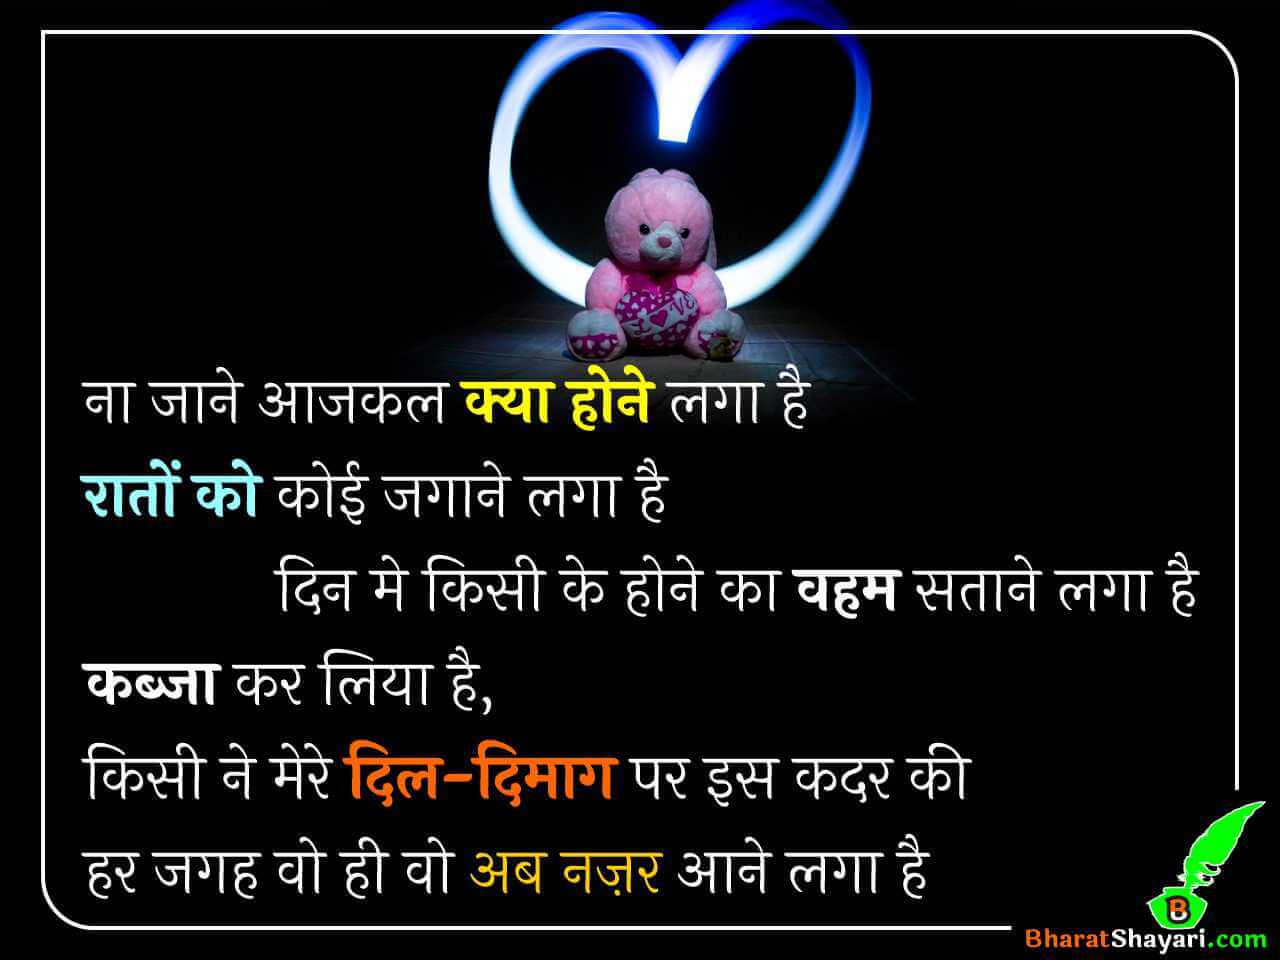 Na jane aajkal kya hone laga hai - Love Shayari in Hindi